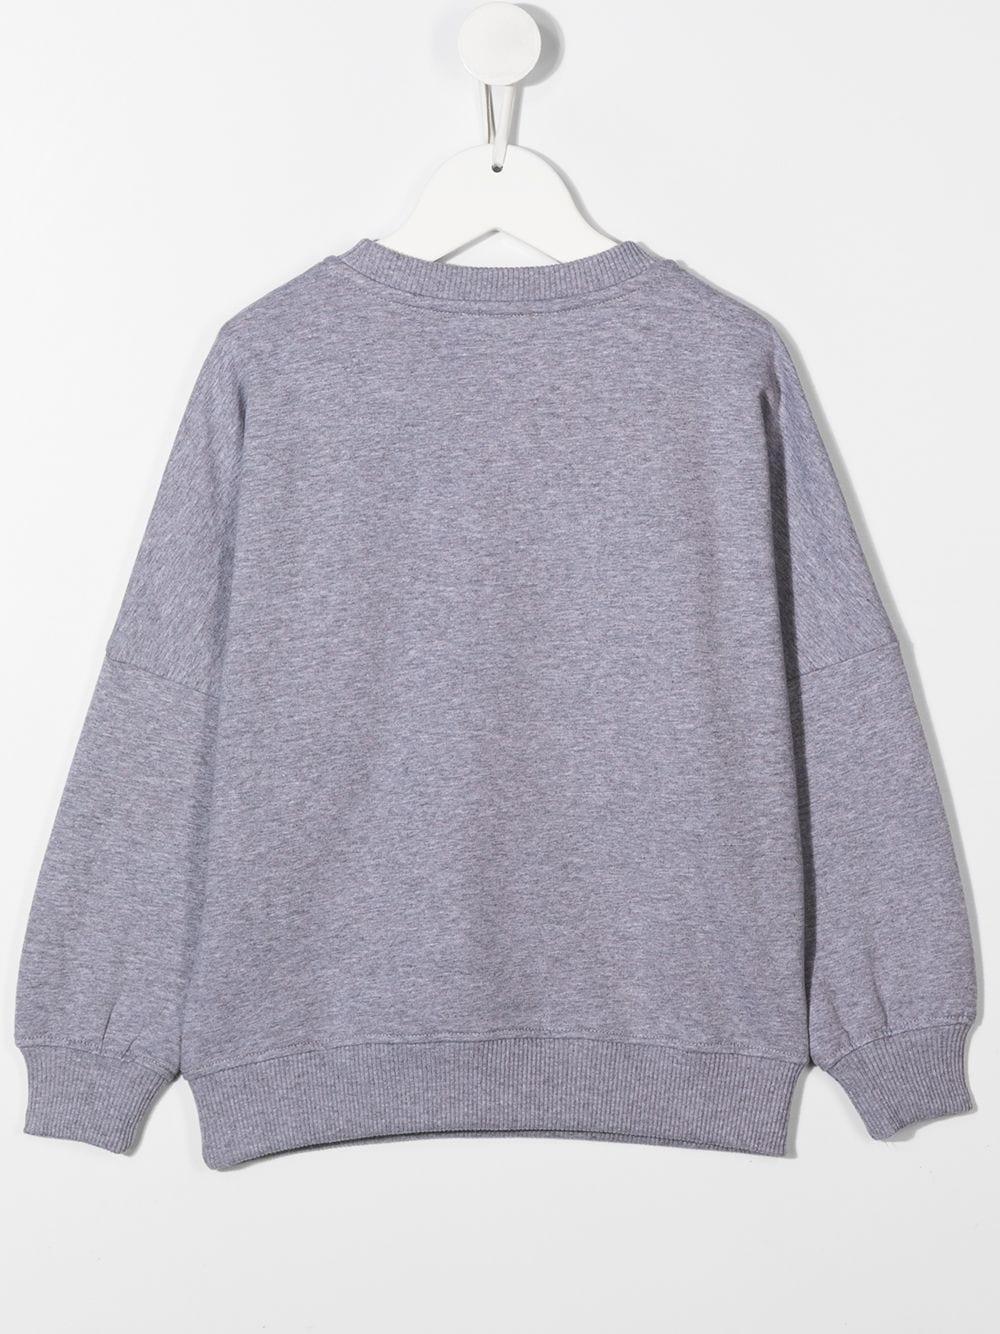 MOSCHINO KIDS | Sweatshirt | HUF048LDA2660901